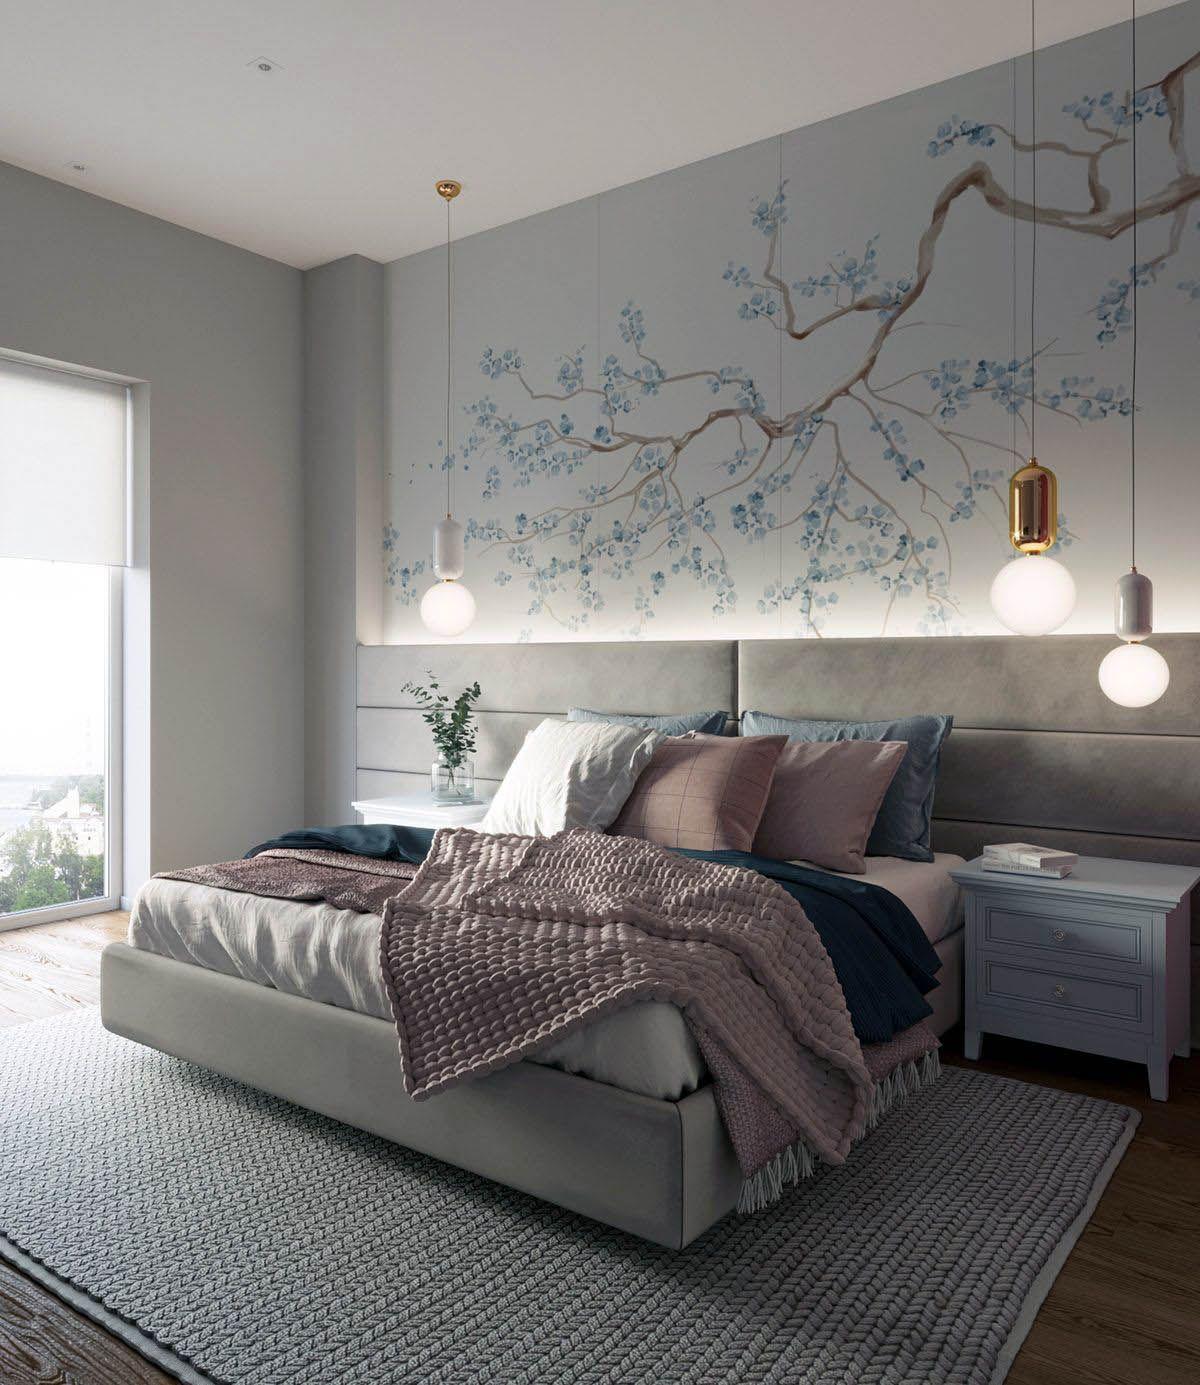 Unbelievable 1 Bedroom Apartments 27606 Exclusive On Homesable Com Roskoshnye Spalni Milye Spalni Kvartirnye Idei